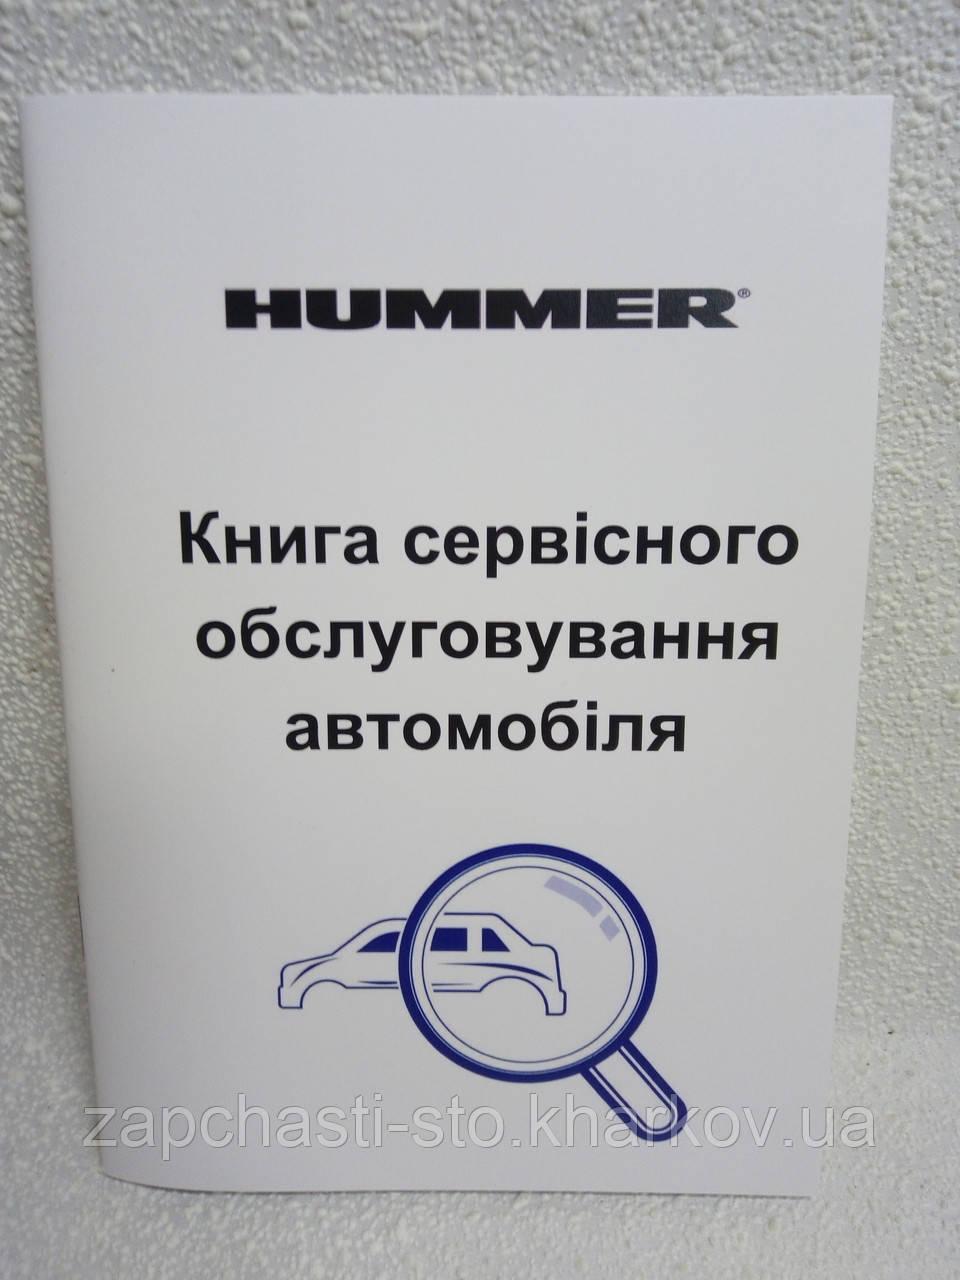 Сервисная книга автомобиля HUMMER (Хаммер)